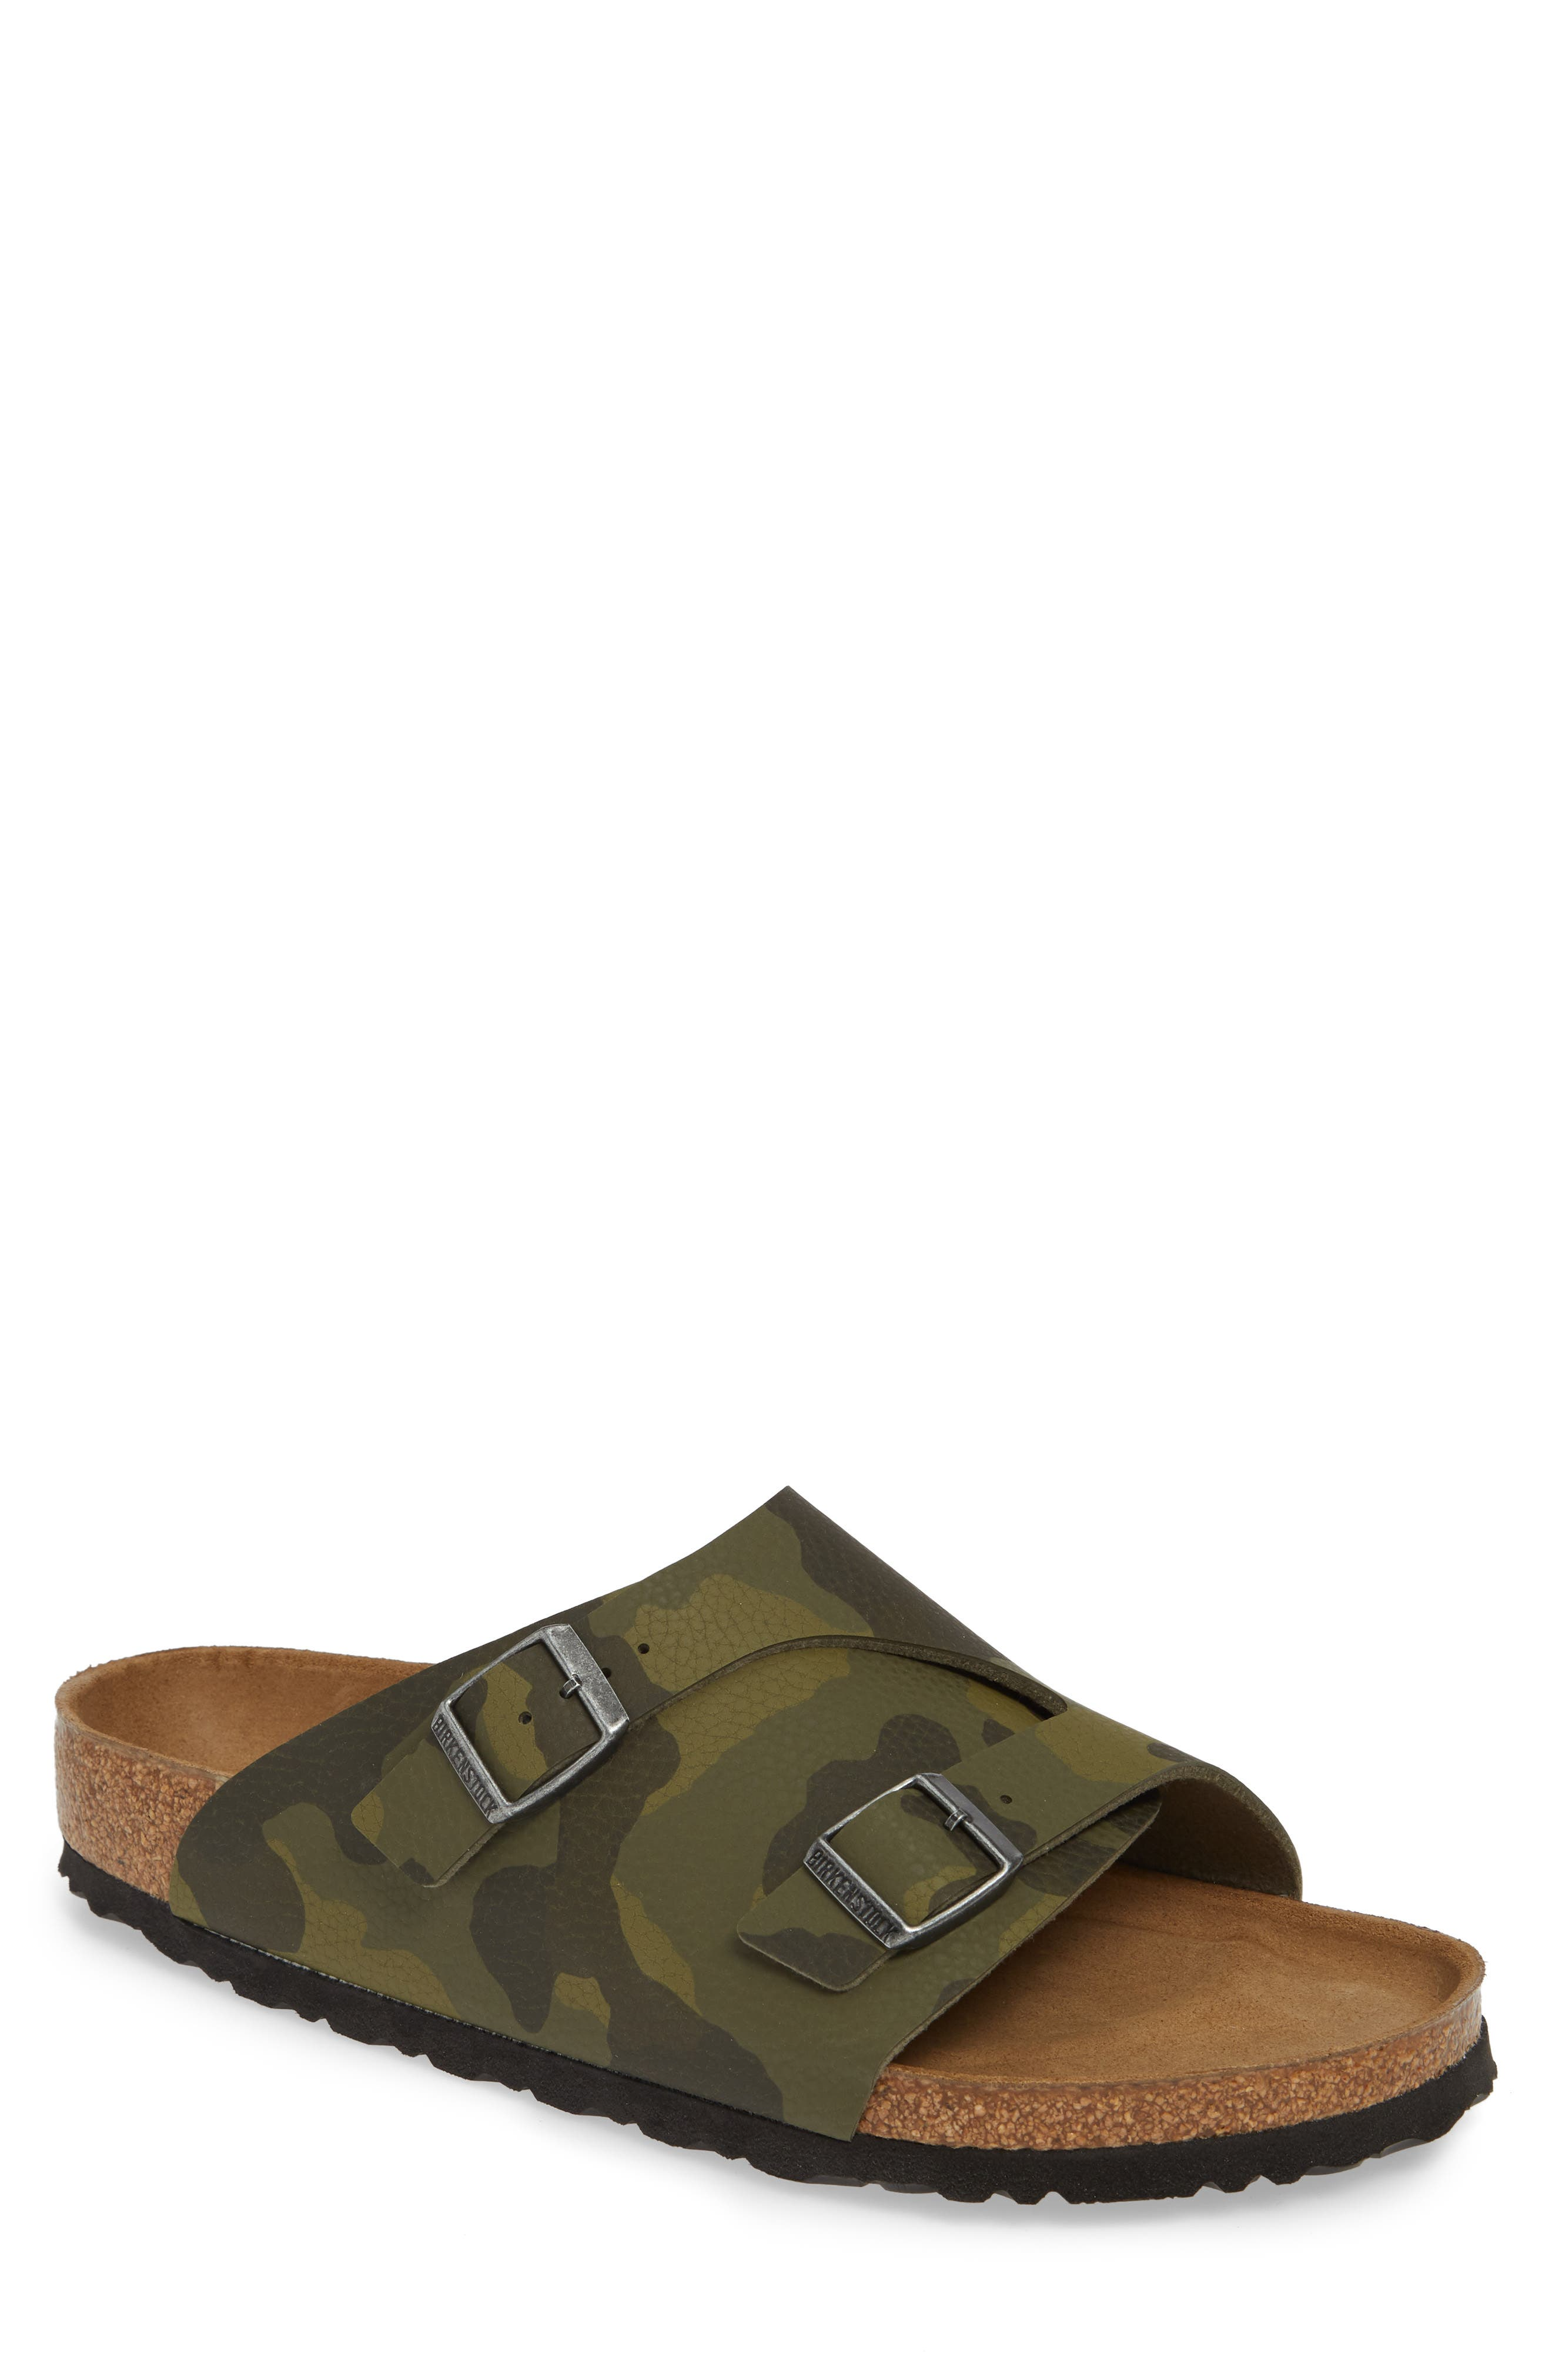 Birkenstock Zurich Slide Sandal,9.5 - Green